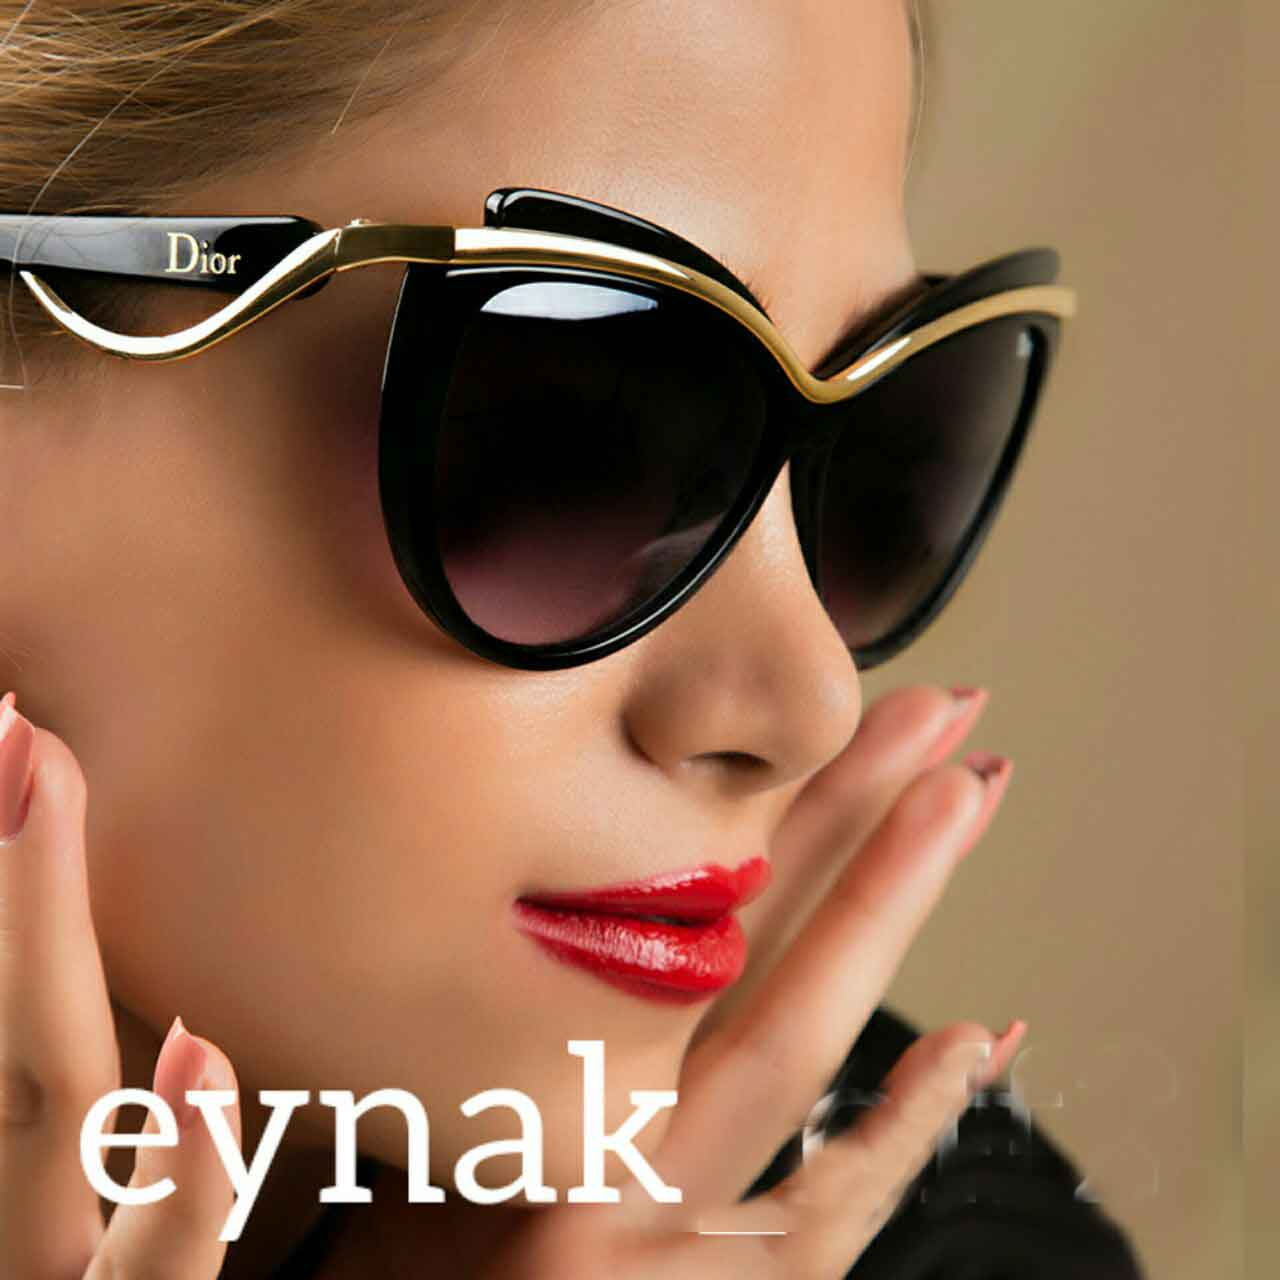 عینک دیور dior